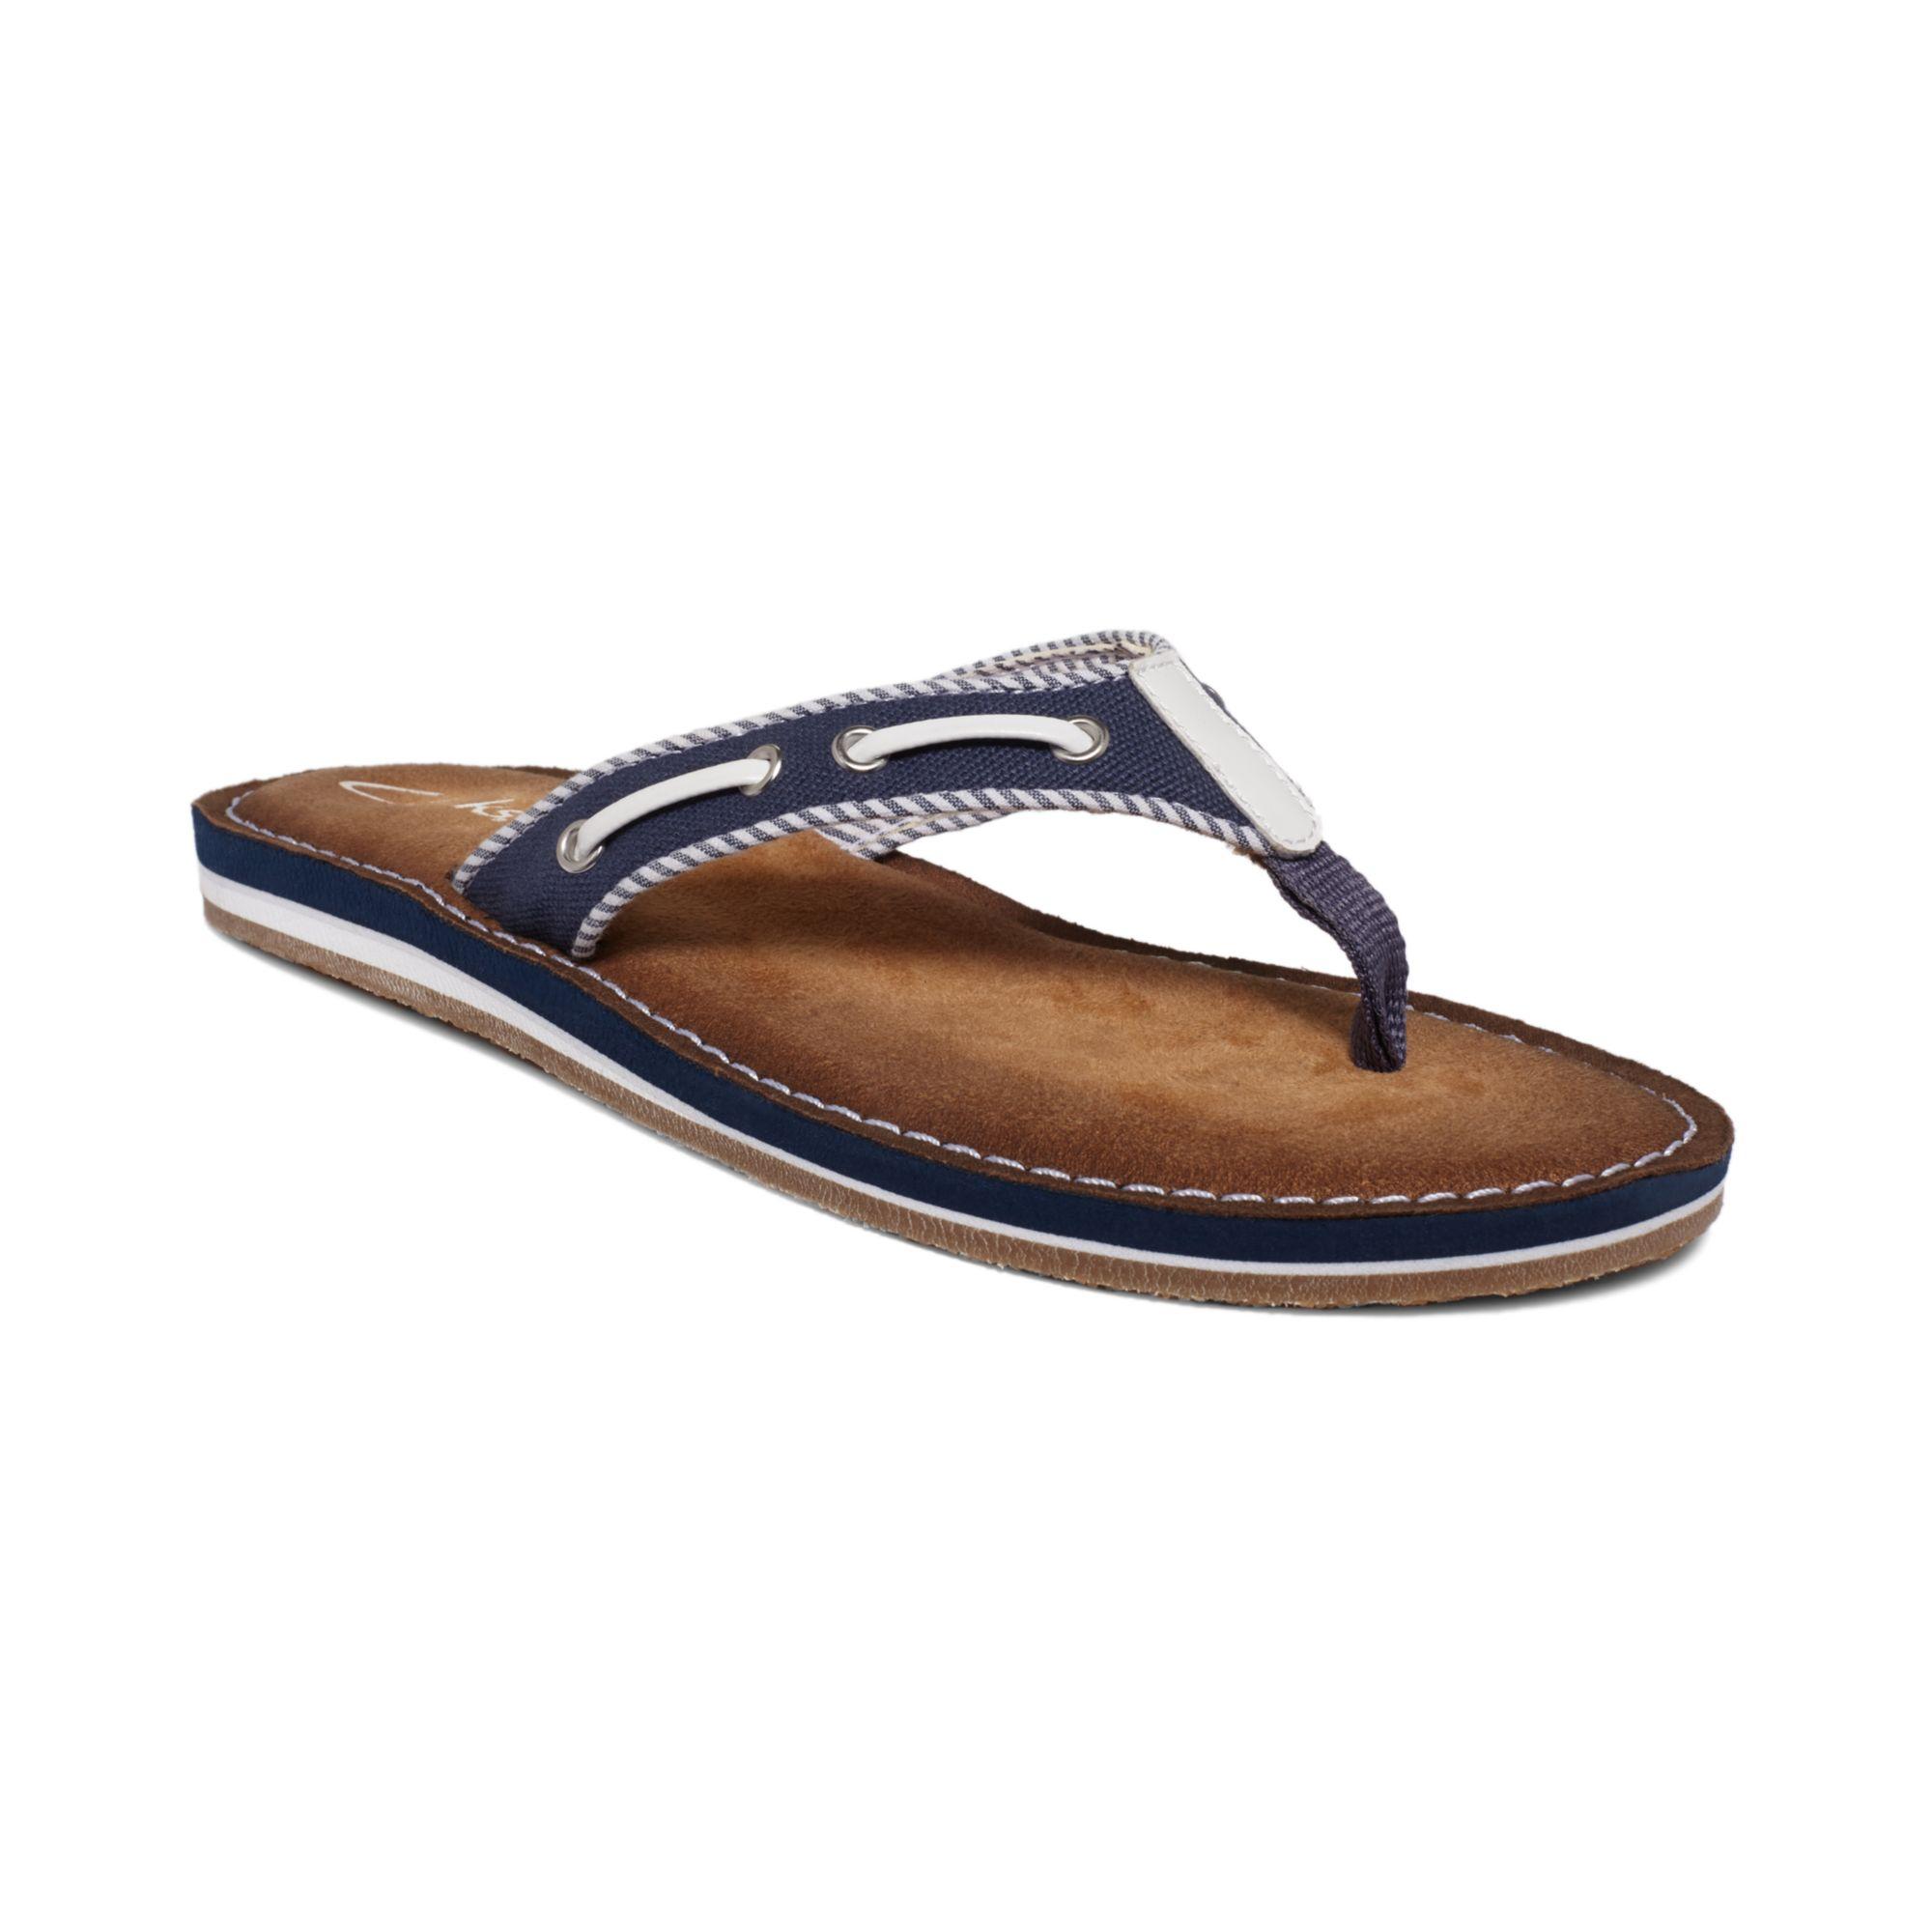 Clarks Womens Shoes Flo Cherrymore Flip Flops in Blue (Navy)